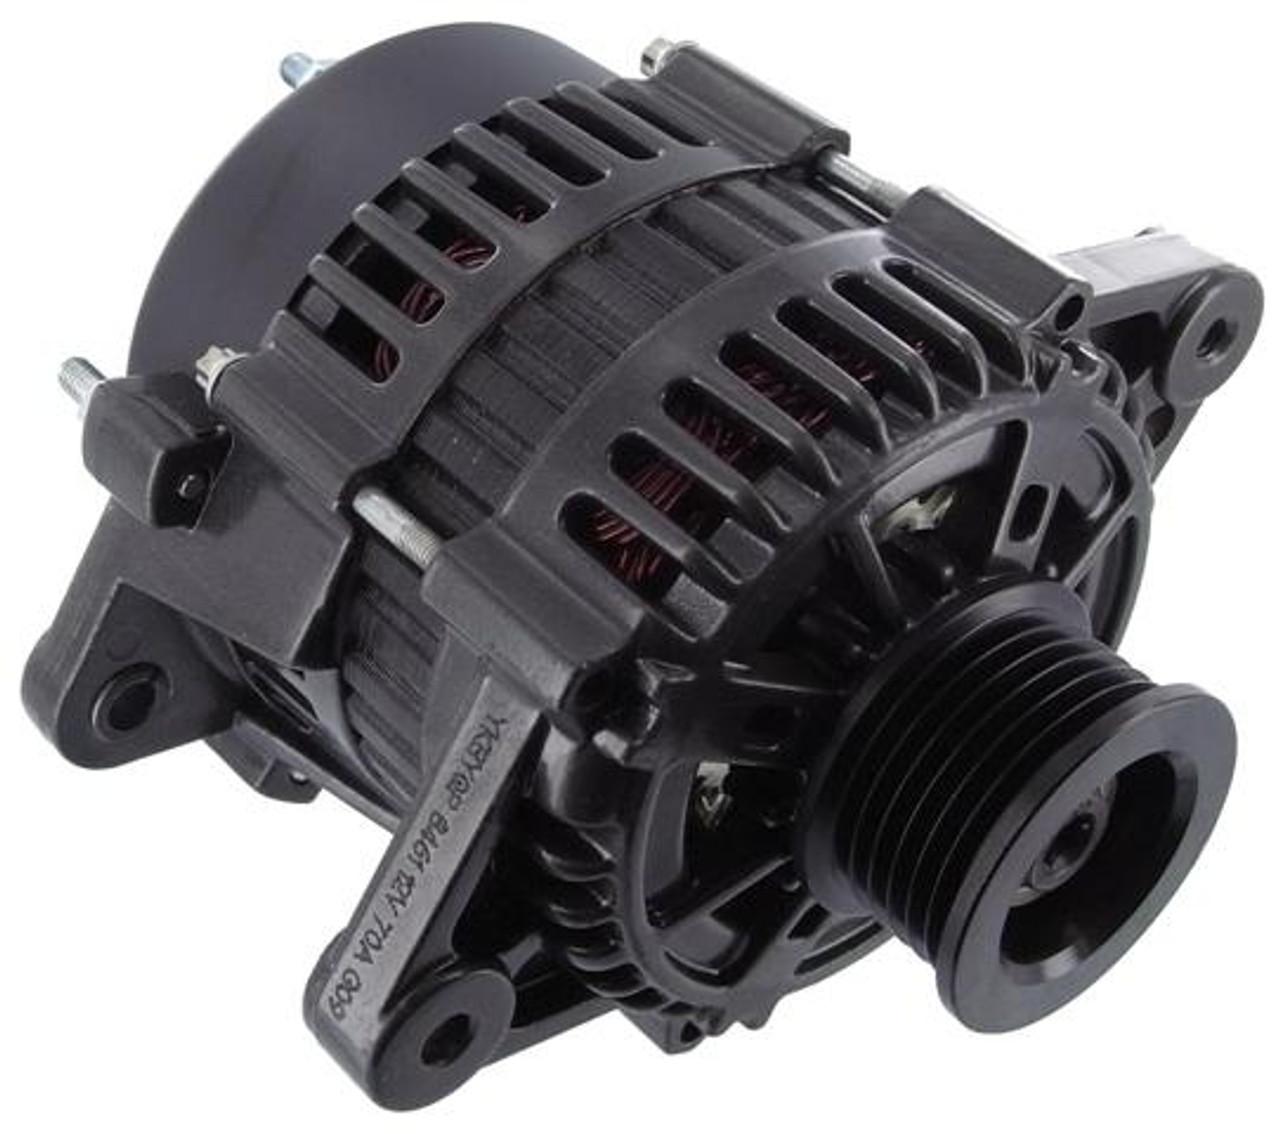 NEW ALTERNATOR MERCRUISER ENGINE 5.7L Ski MX 6.2L BS MPI 350 Mag Alpha Bravo